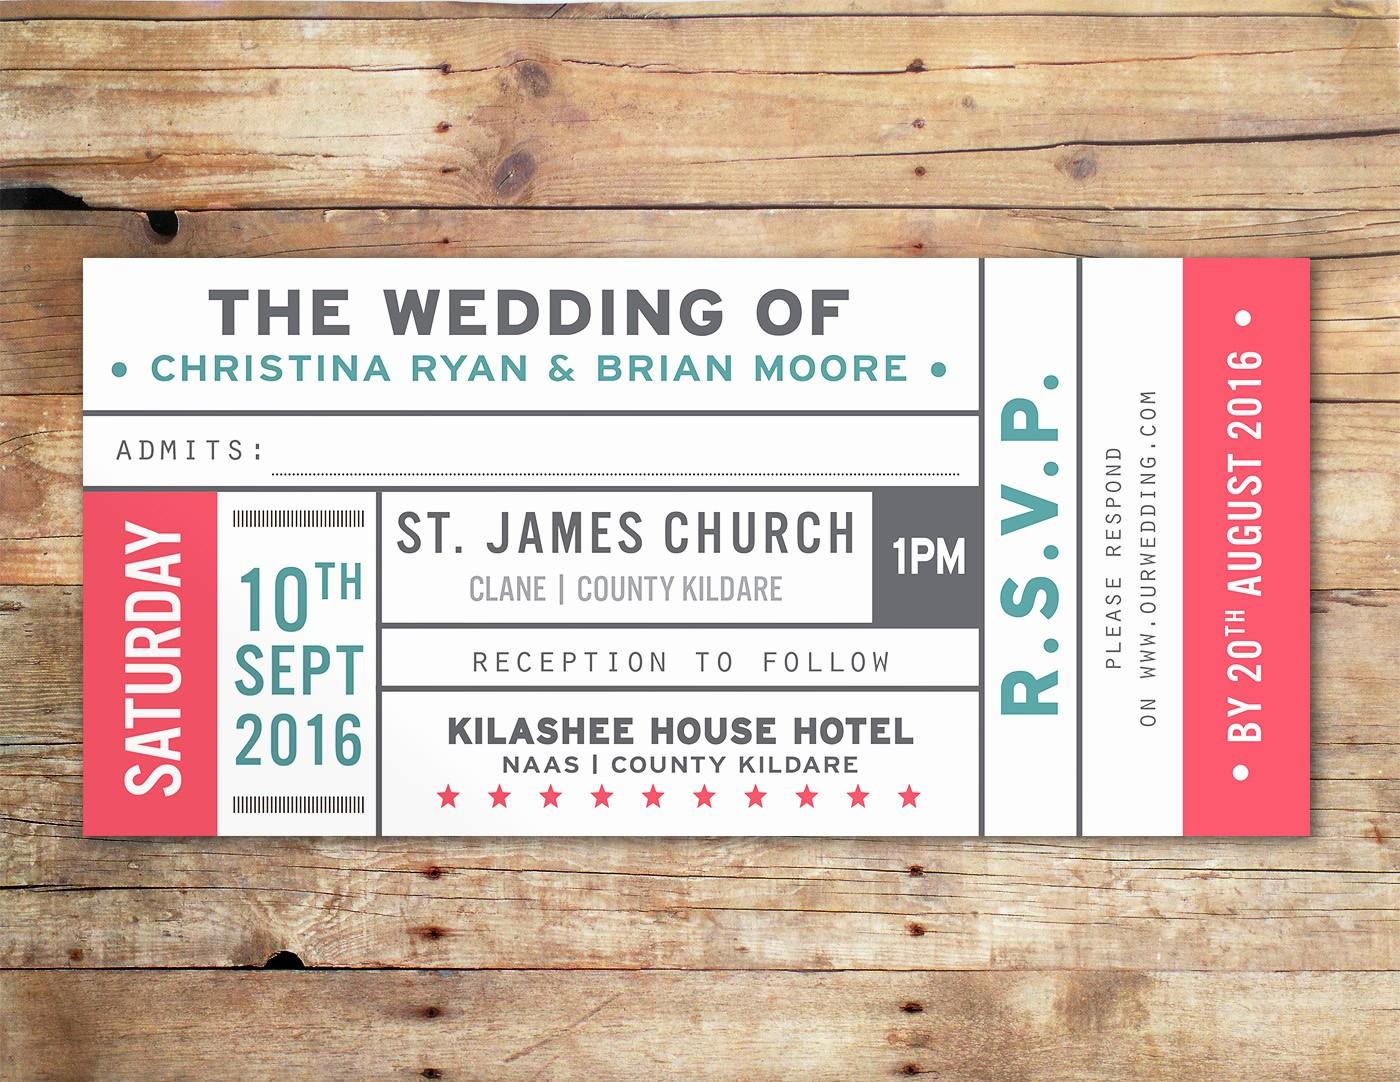 How to Make Ticket Invitations Beautiful Vintage Ticket Wedding Invitations Uk & Ireland